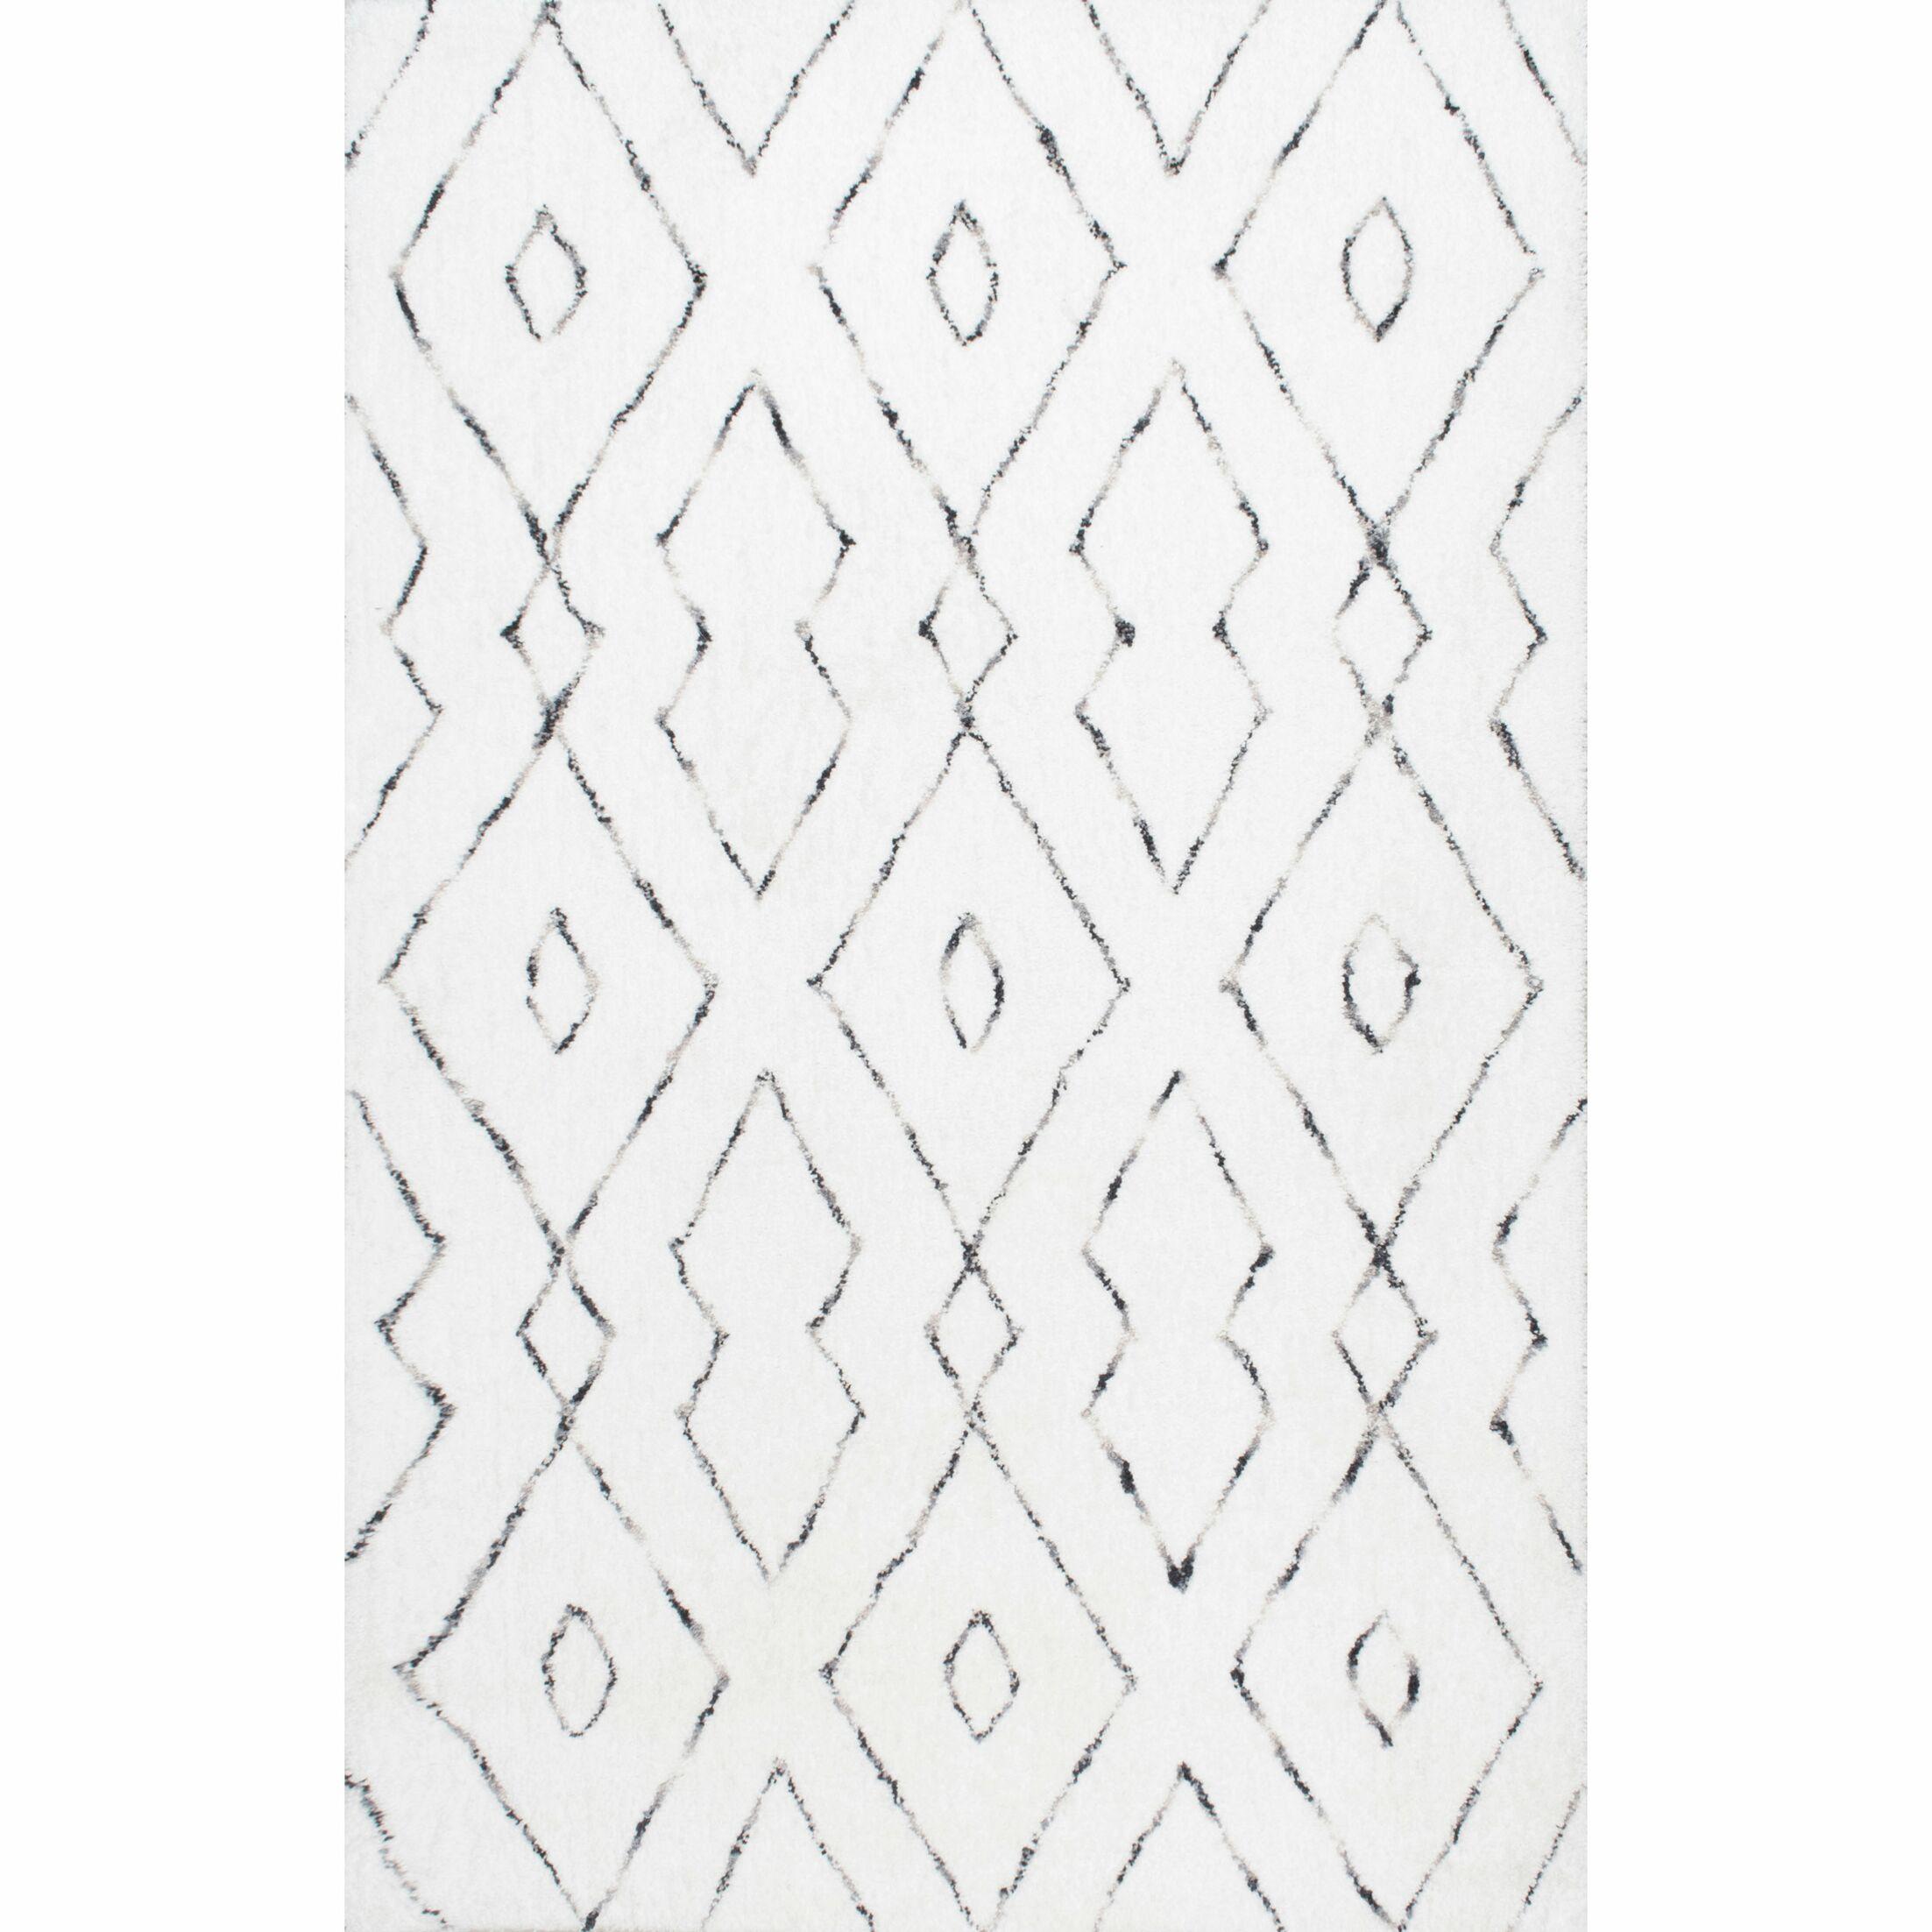 Peraza Hand-Tufted White Area Rug Rug Size: Rectangle 4' x 6'